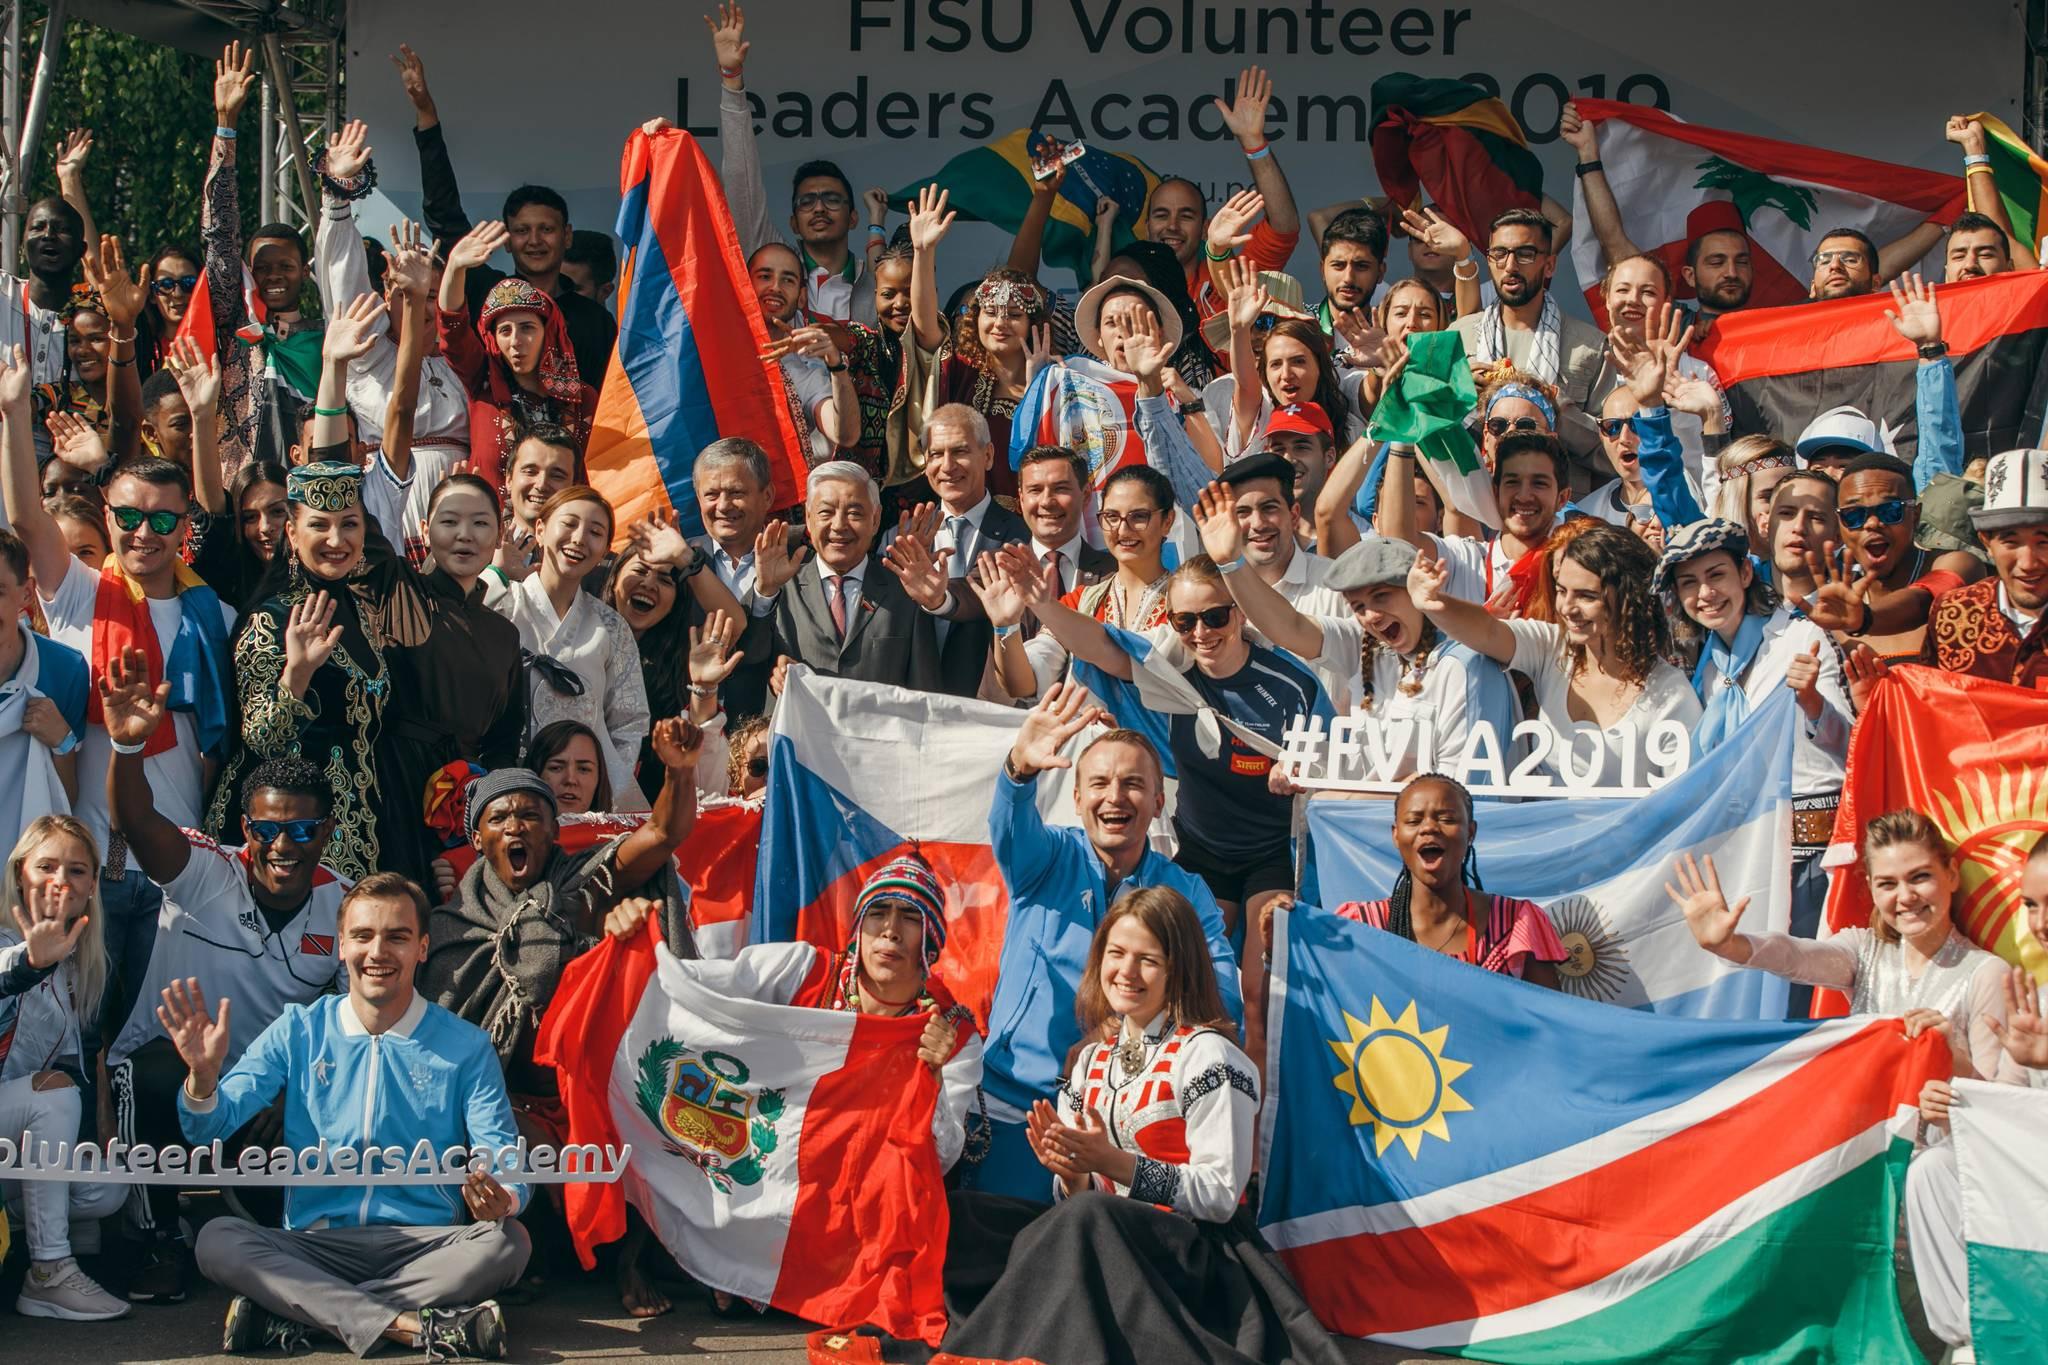 FISU hold third edition of Volunteer Leaders Academy in Tatarstan